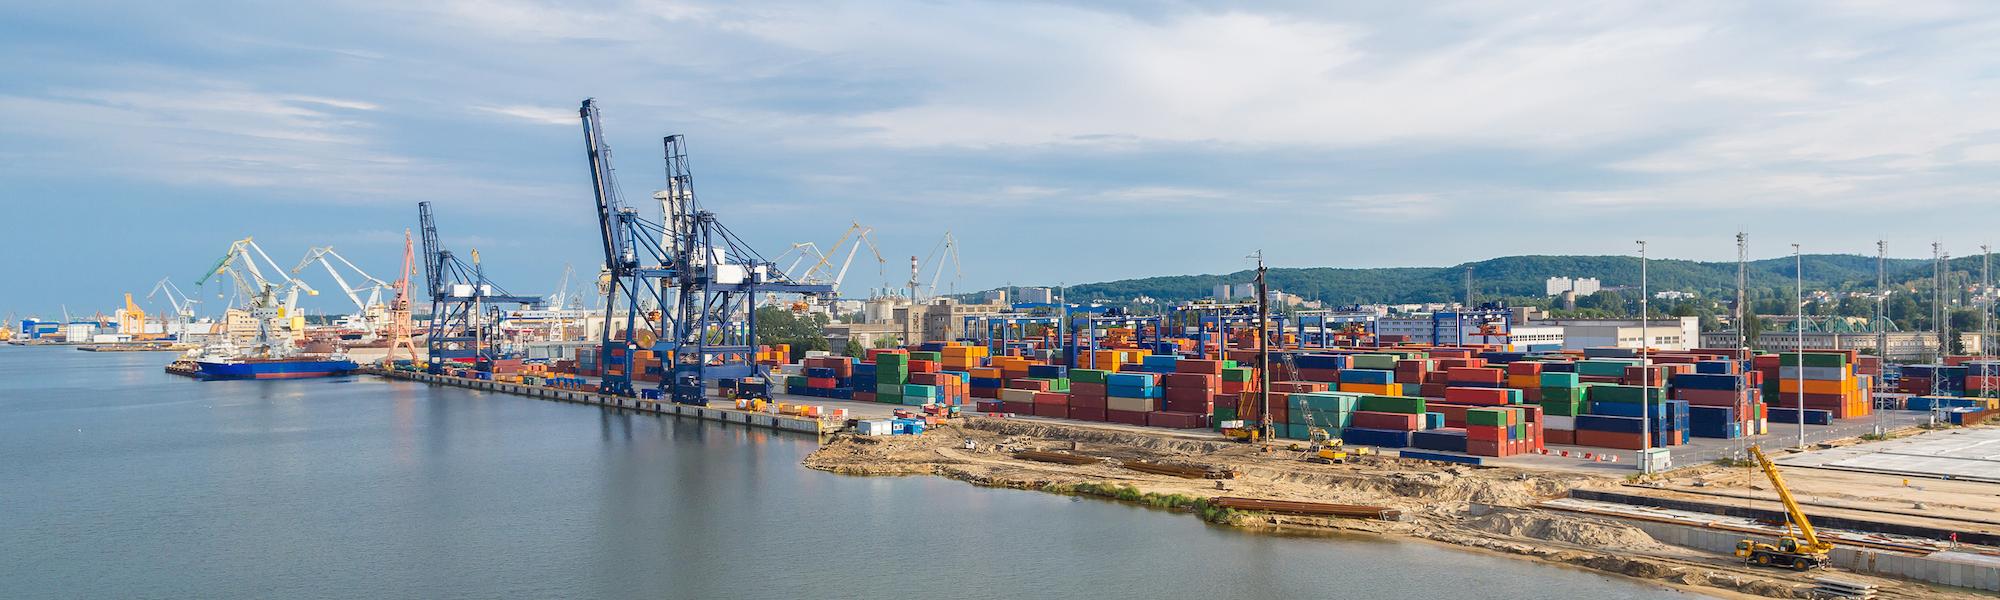 Port Detention Spain Ship Detention Vessel